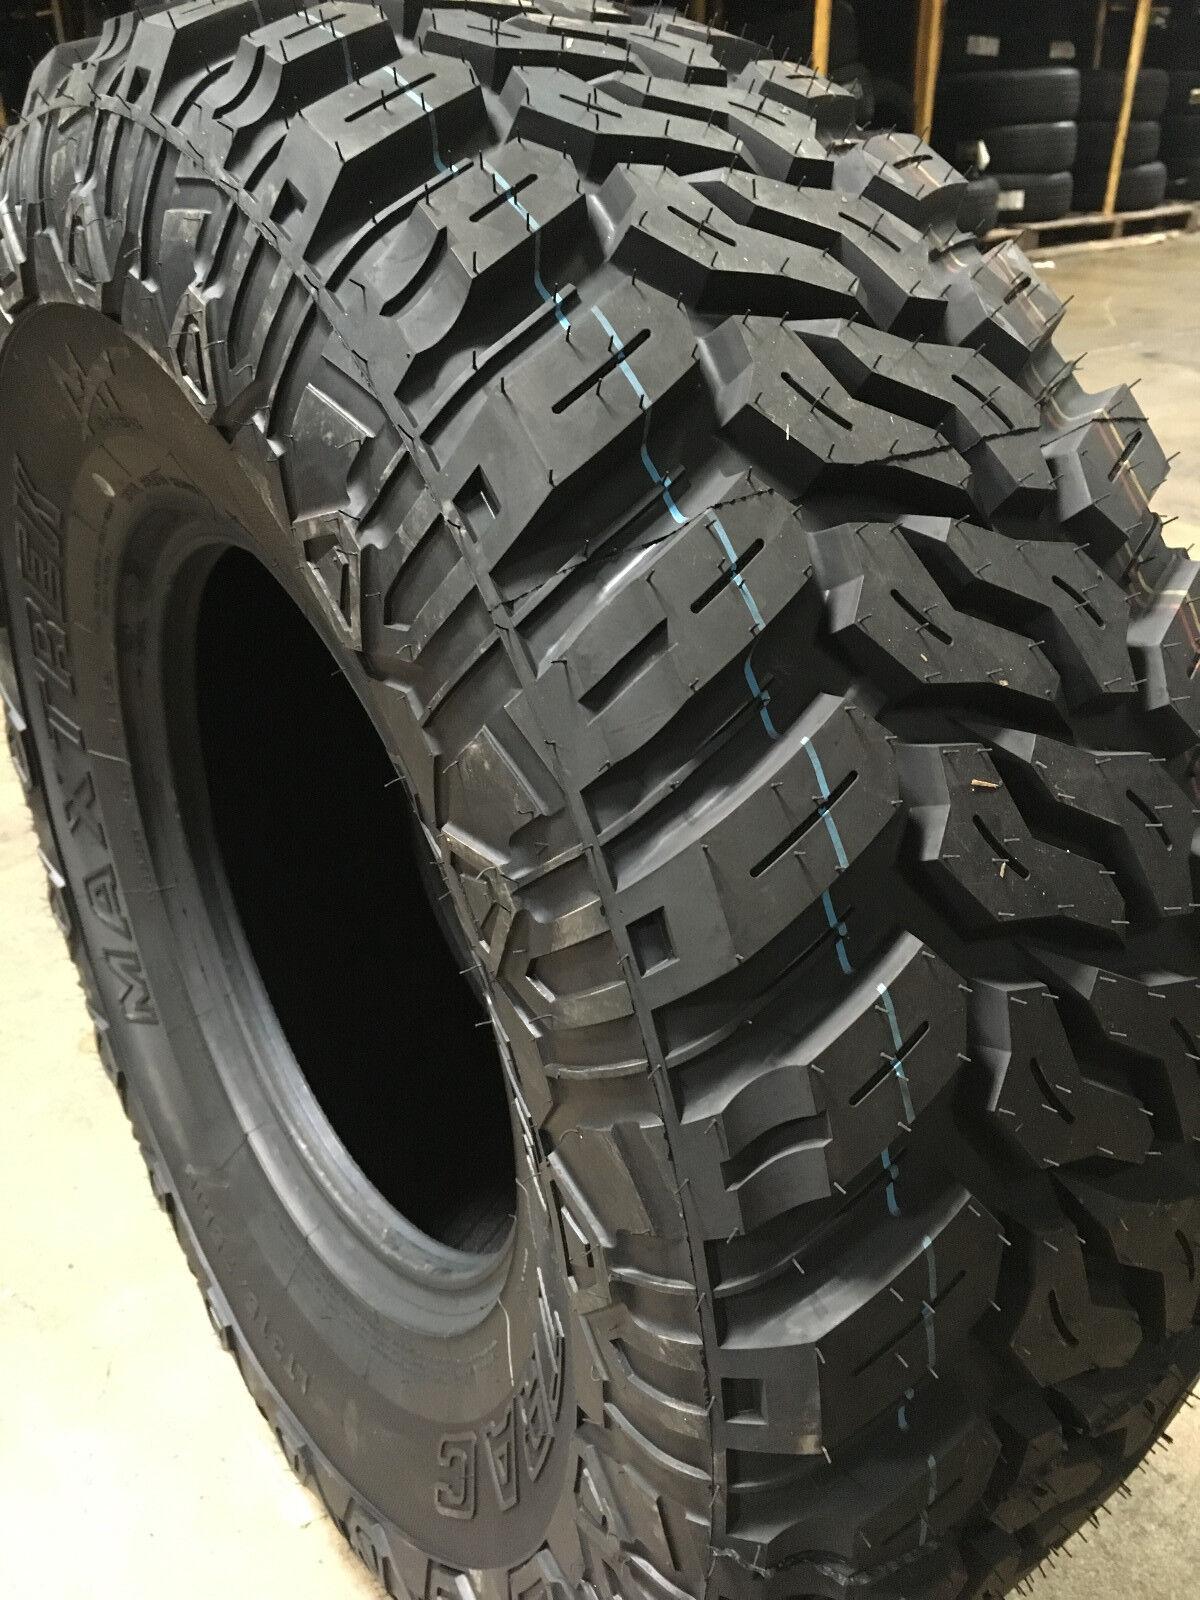 4 285 70r17 MAXTREK Mud Trac M t Mud Tires MT 285 70 17 R17